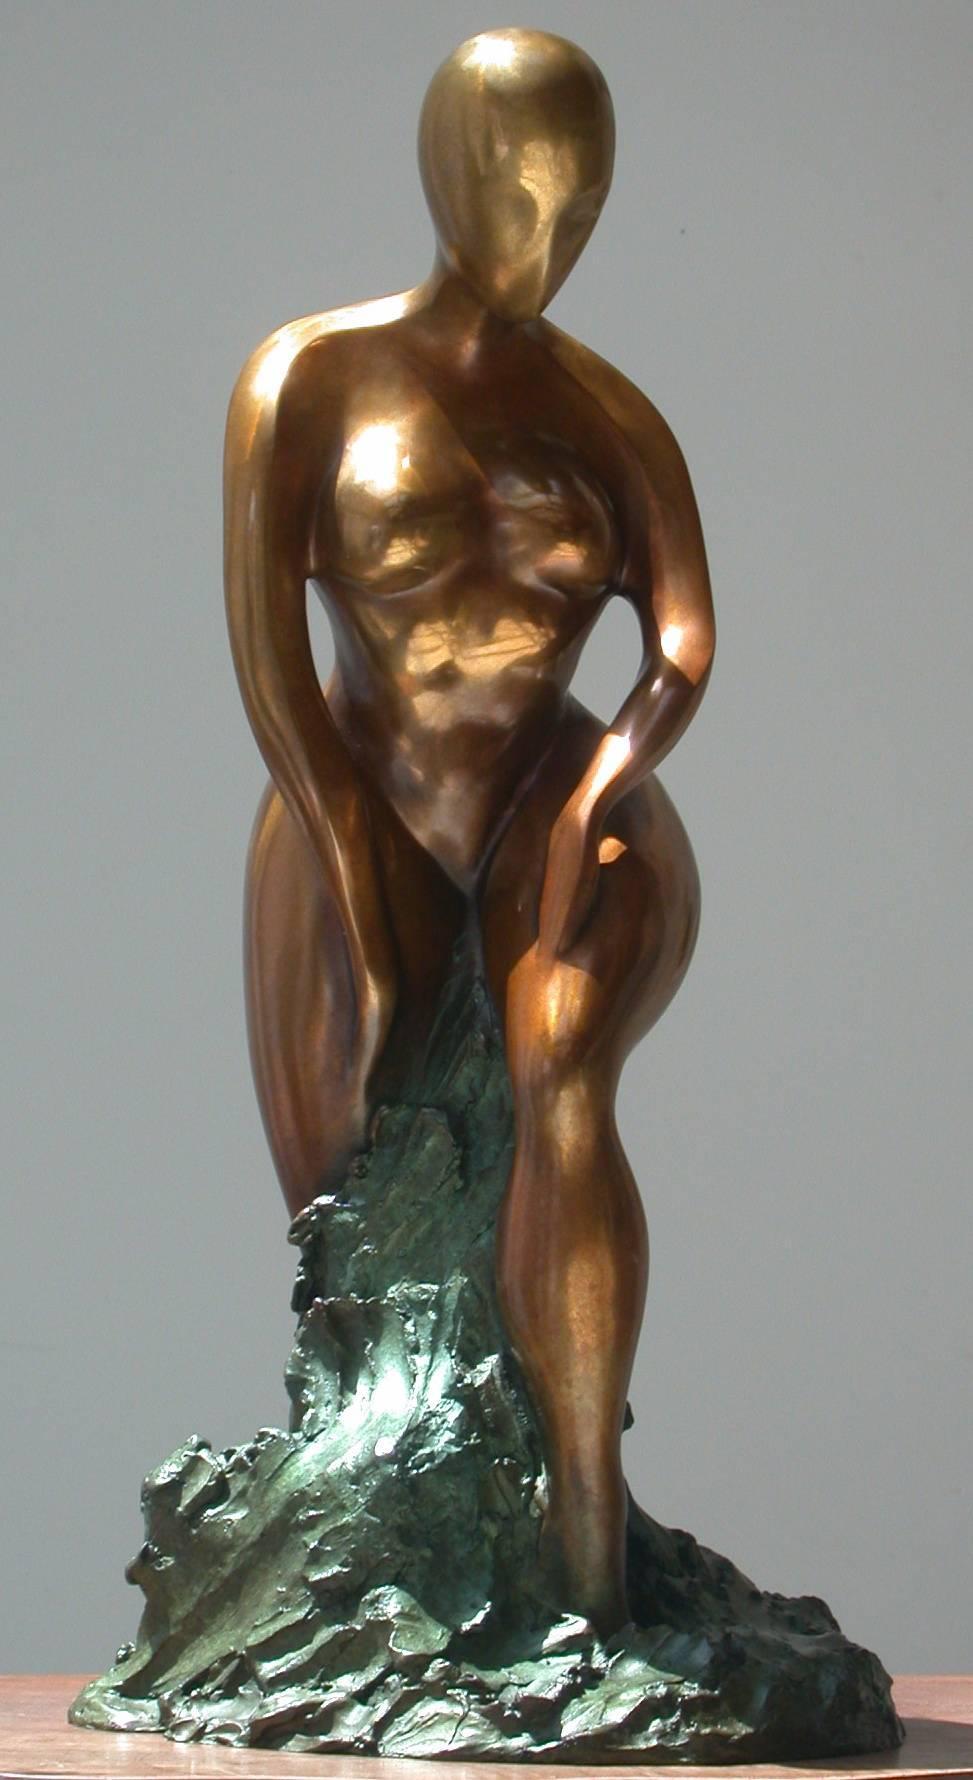 Trepidation by Shray, Bronze Figurative Sculpture, Contemporary Sculpture